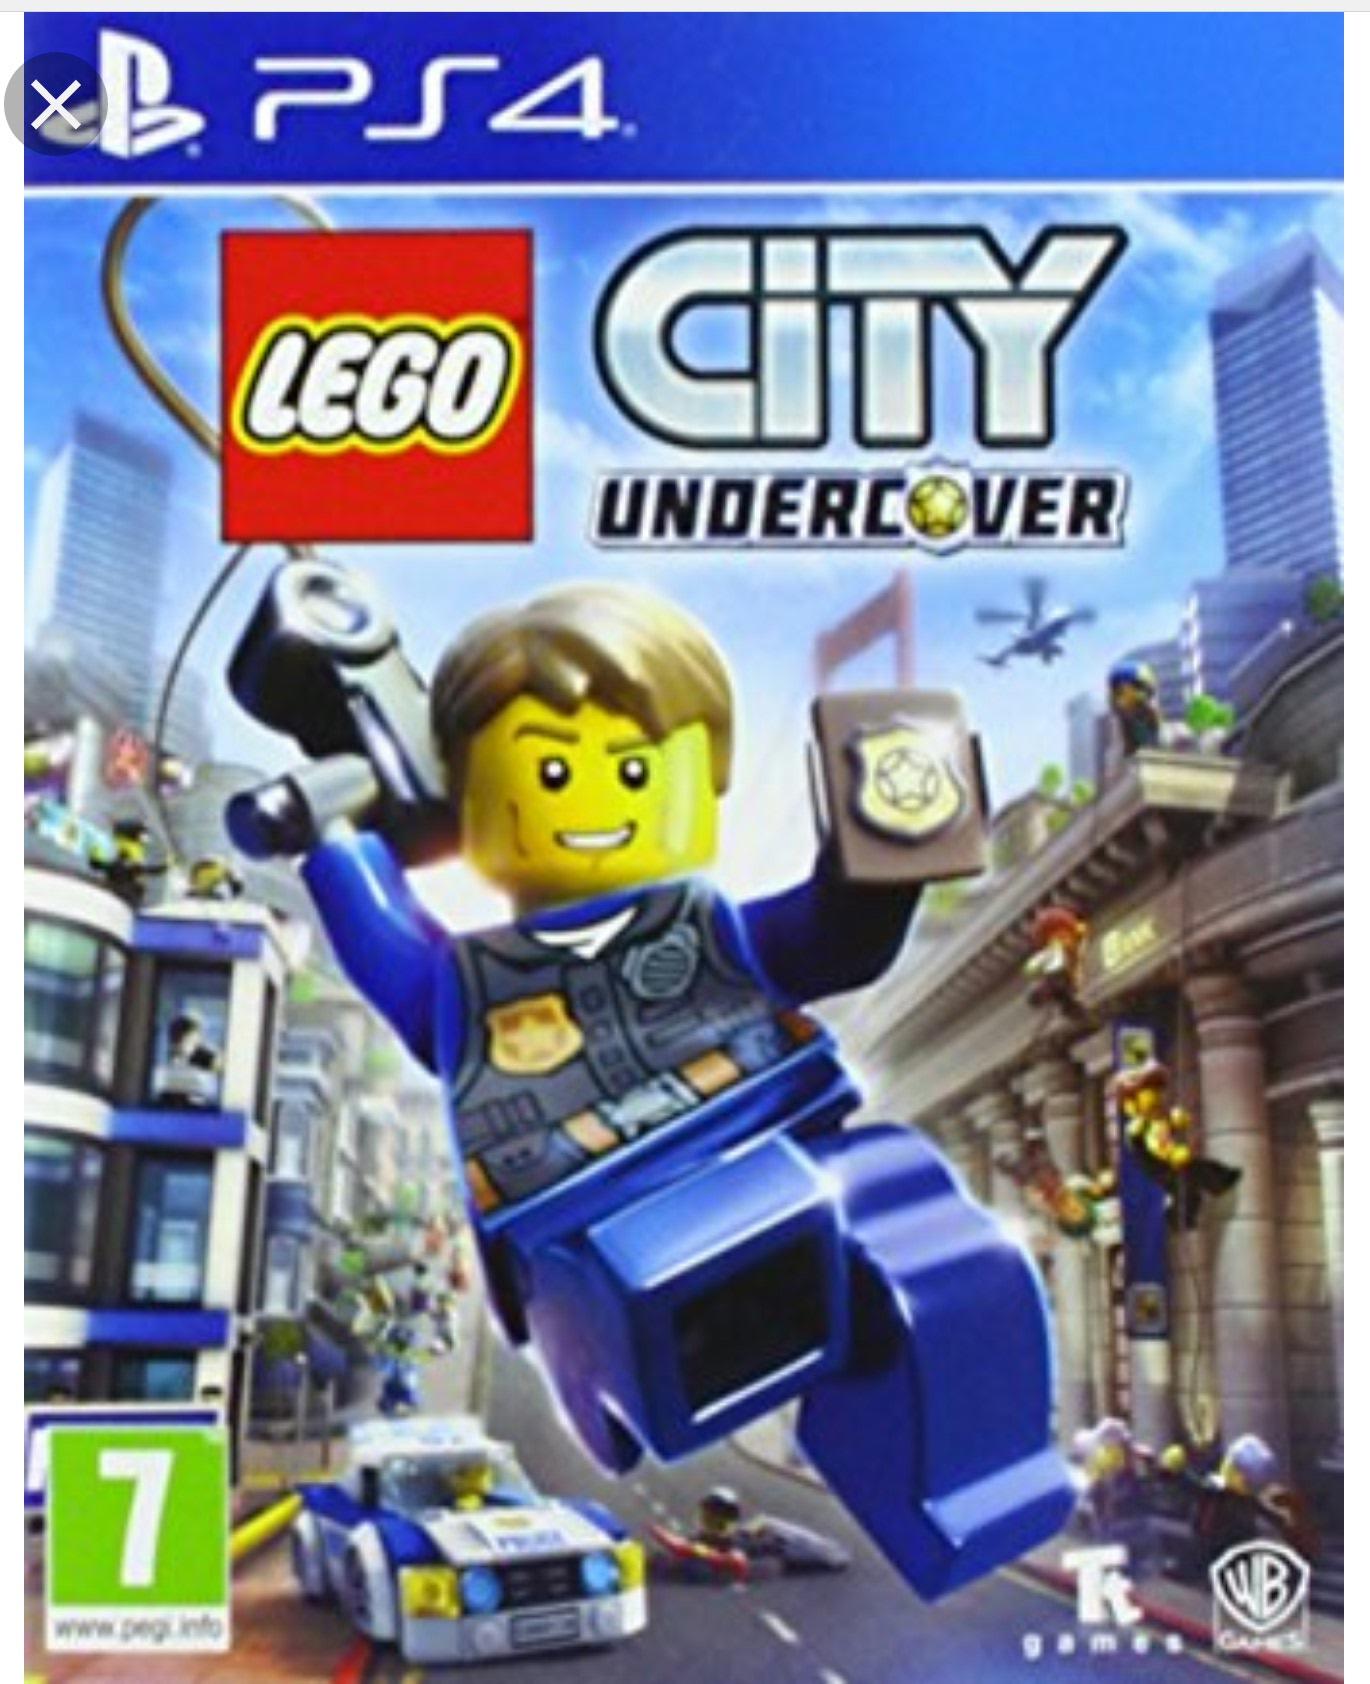 LEGO City Undercover (PS4) £14.85 @ Base.com